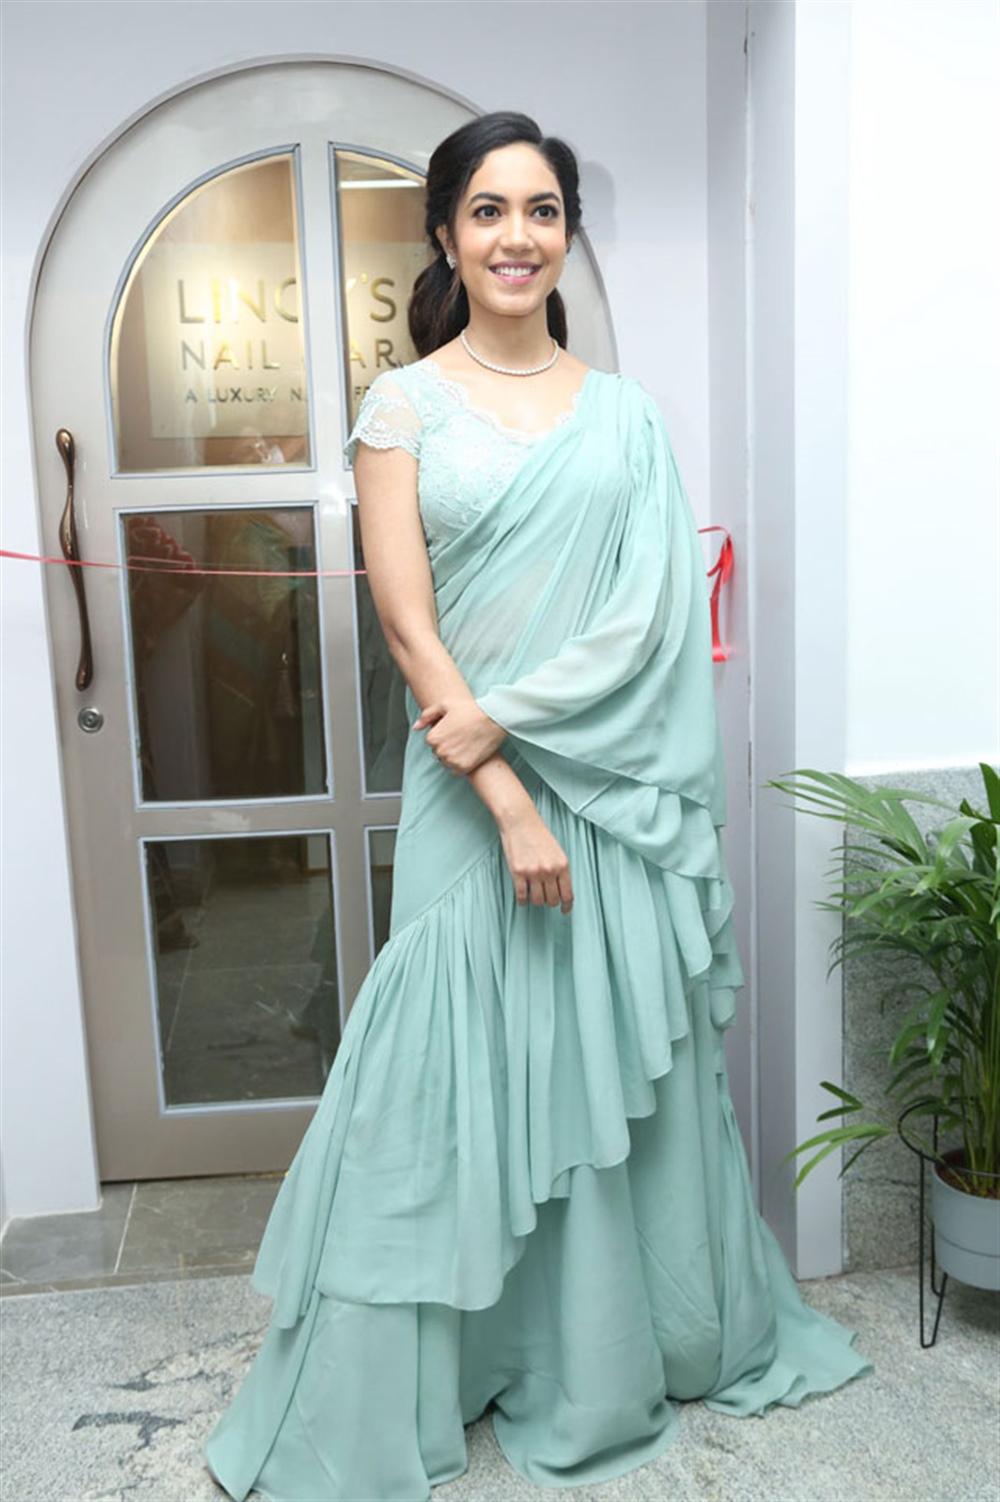 Actress Ritu Varma Inaugurates Lincy's Nail Bar Salon at Jubilee Hills Photos